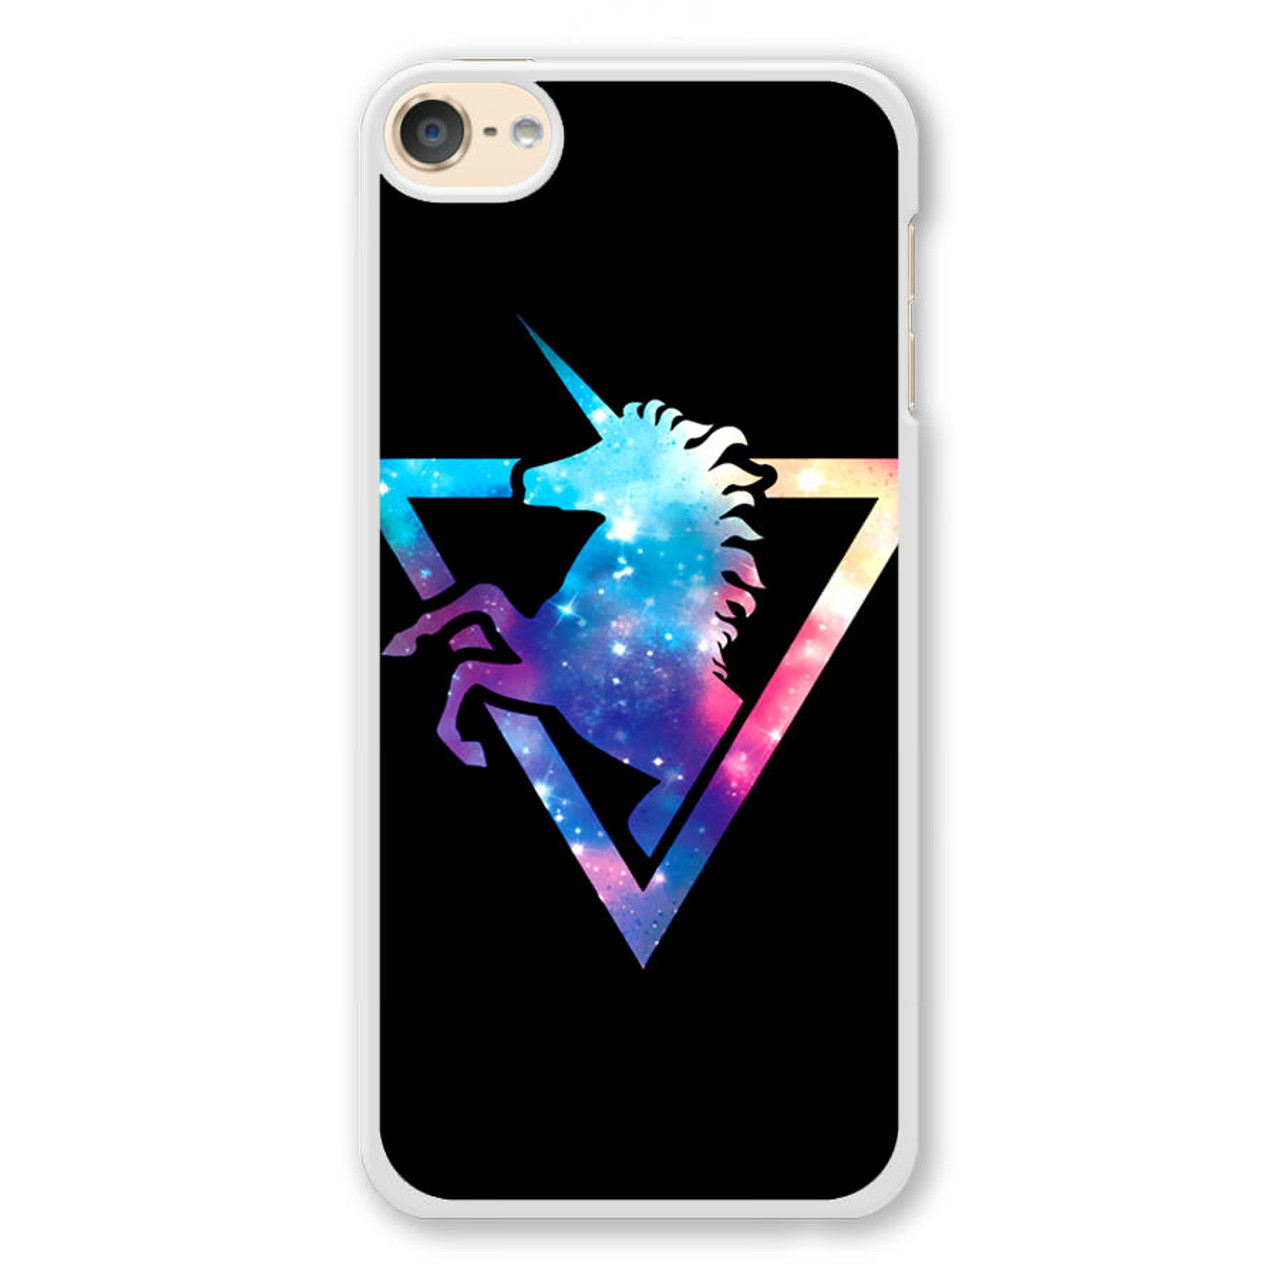 Galaxy Unicorn - Unicorn - Phone Case